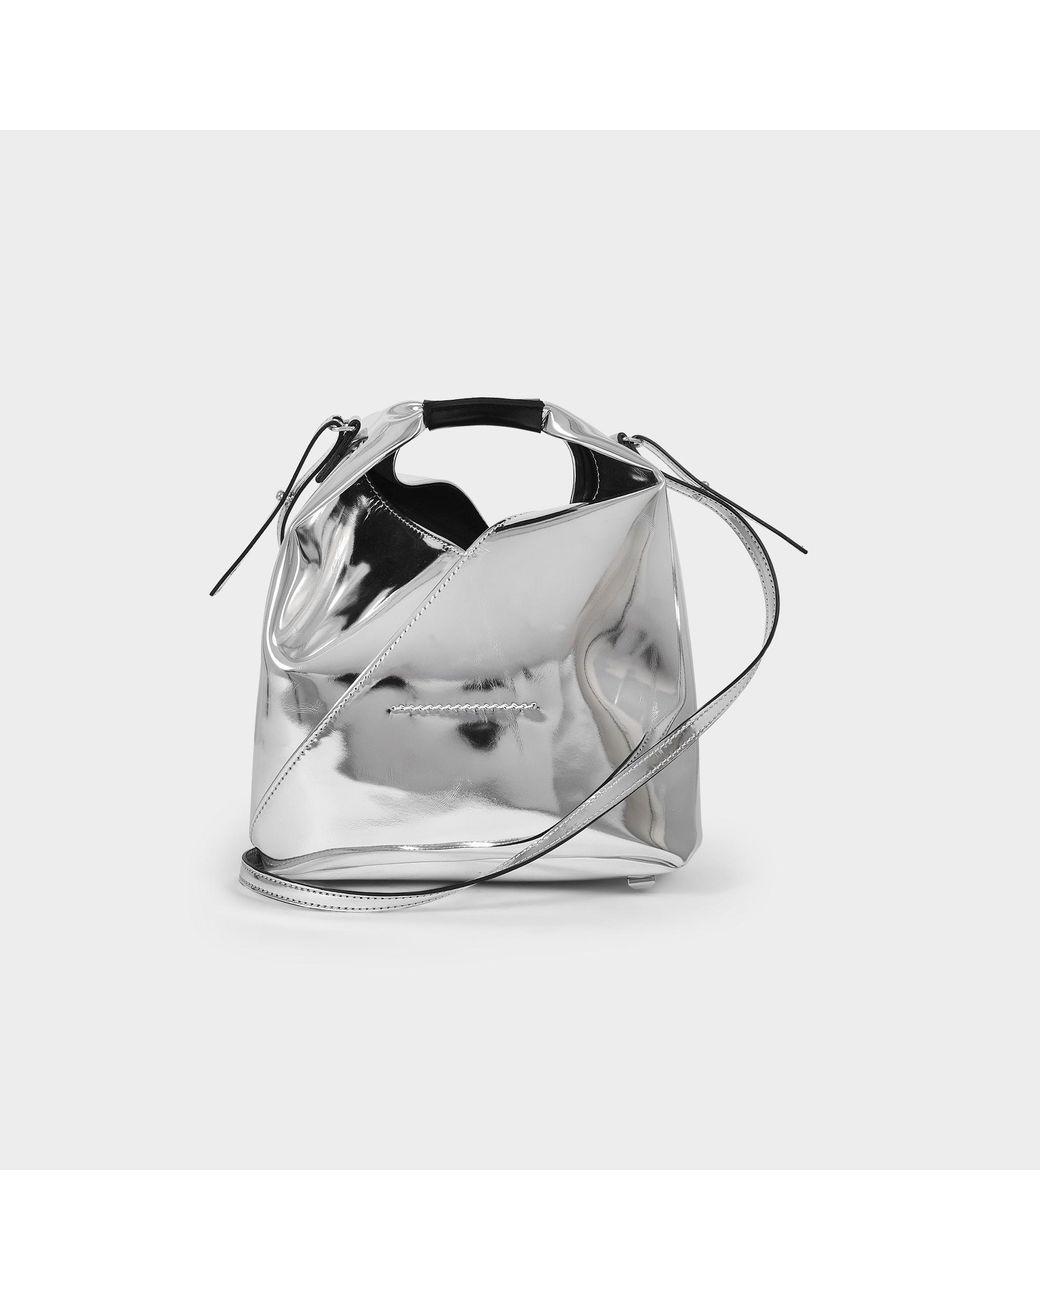 MM6 MAISON MARGIELA Metallic Silver Mini Nano Bag